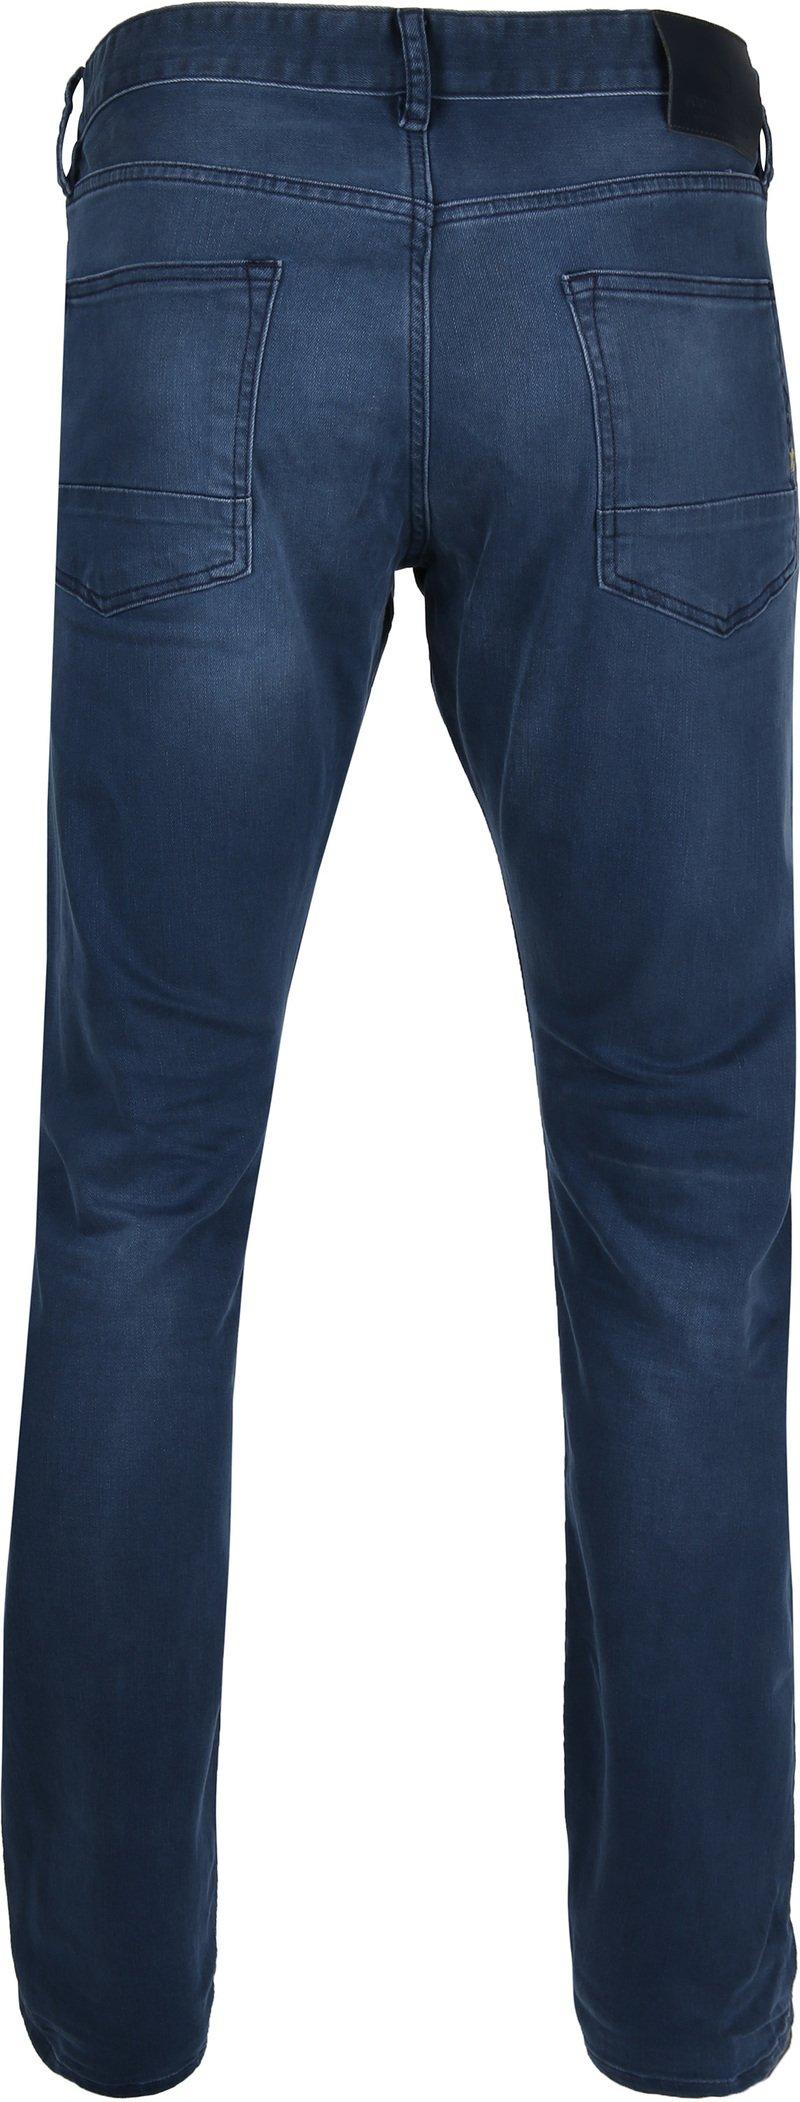 Scotch and Soda Ralston Jeans Concrete Blauw